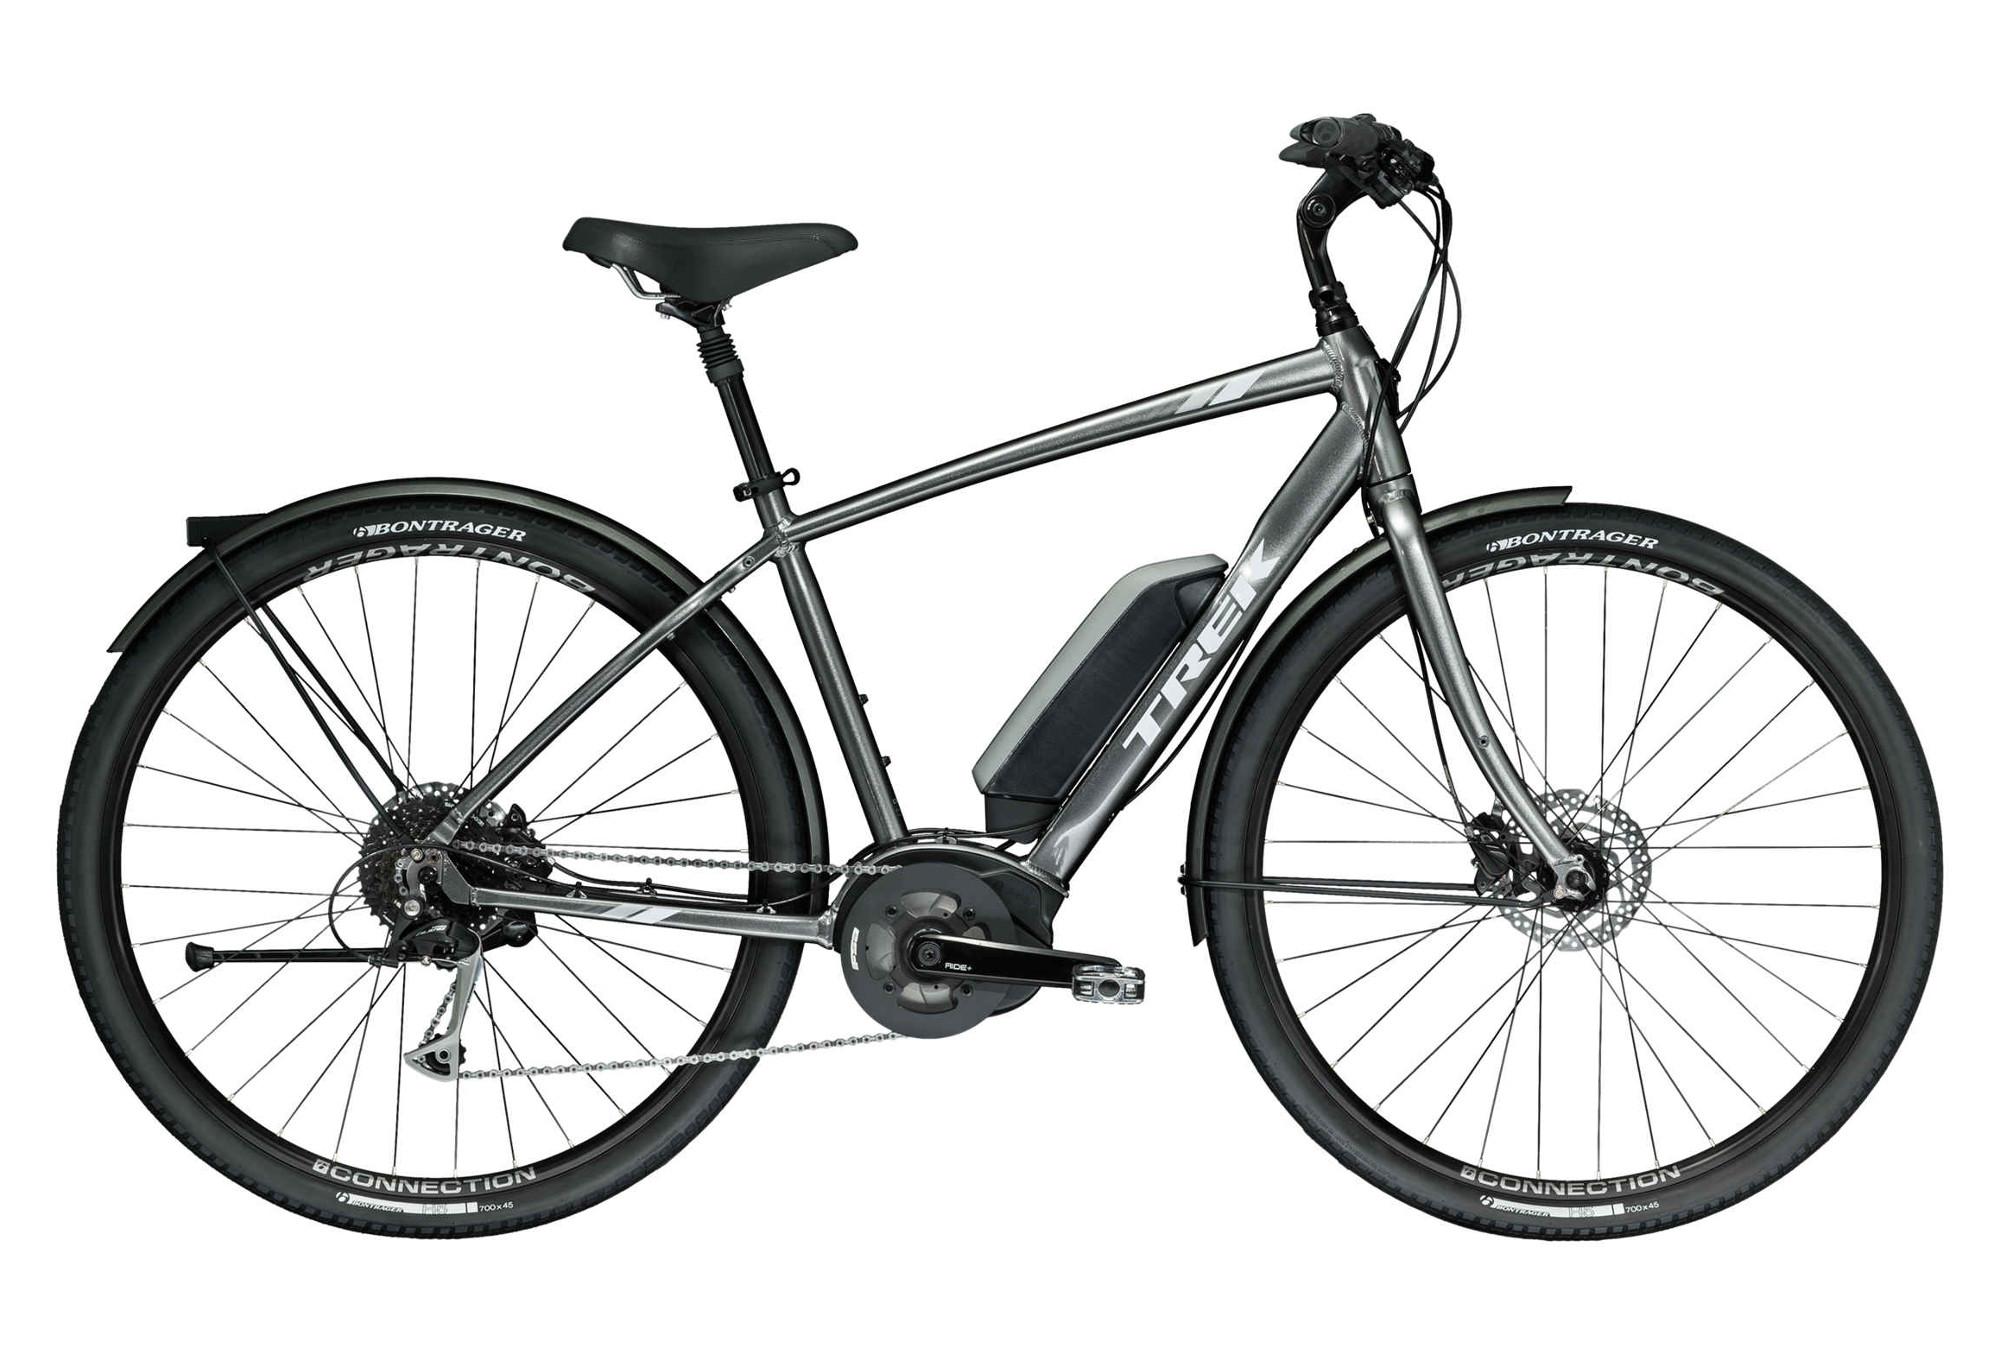 Trek Verve+ Hybrid Urban Bike Shimano Alivio 9S Grey 2019